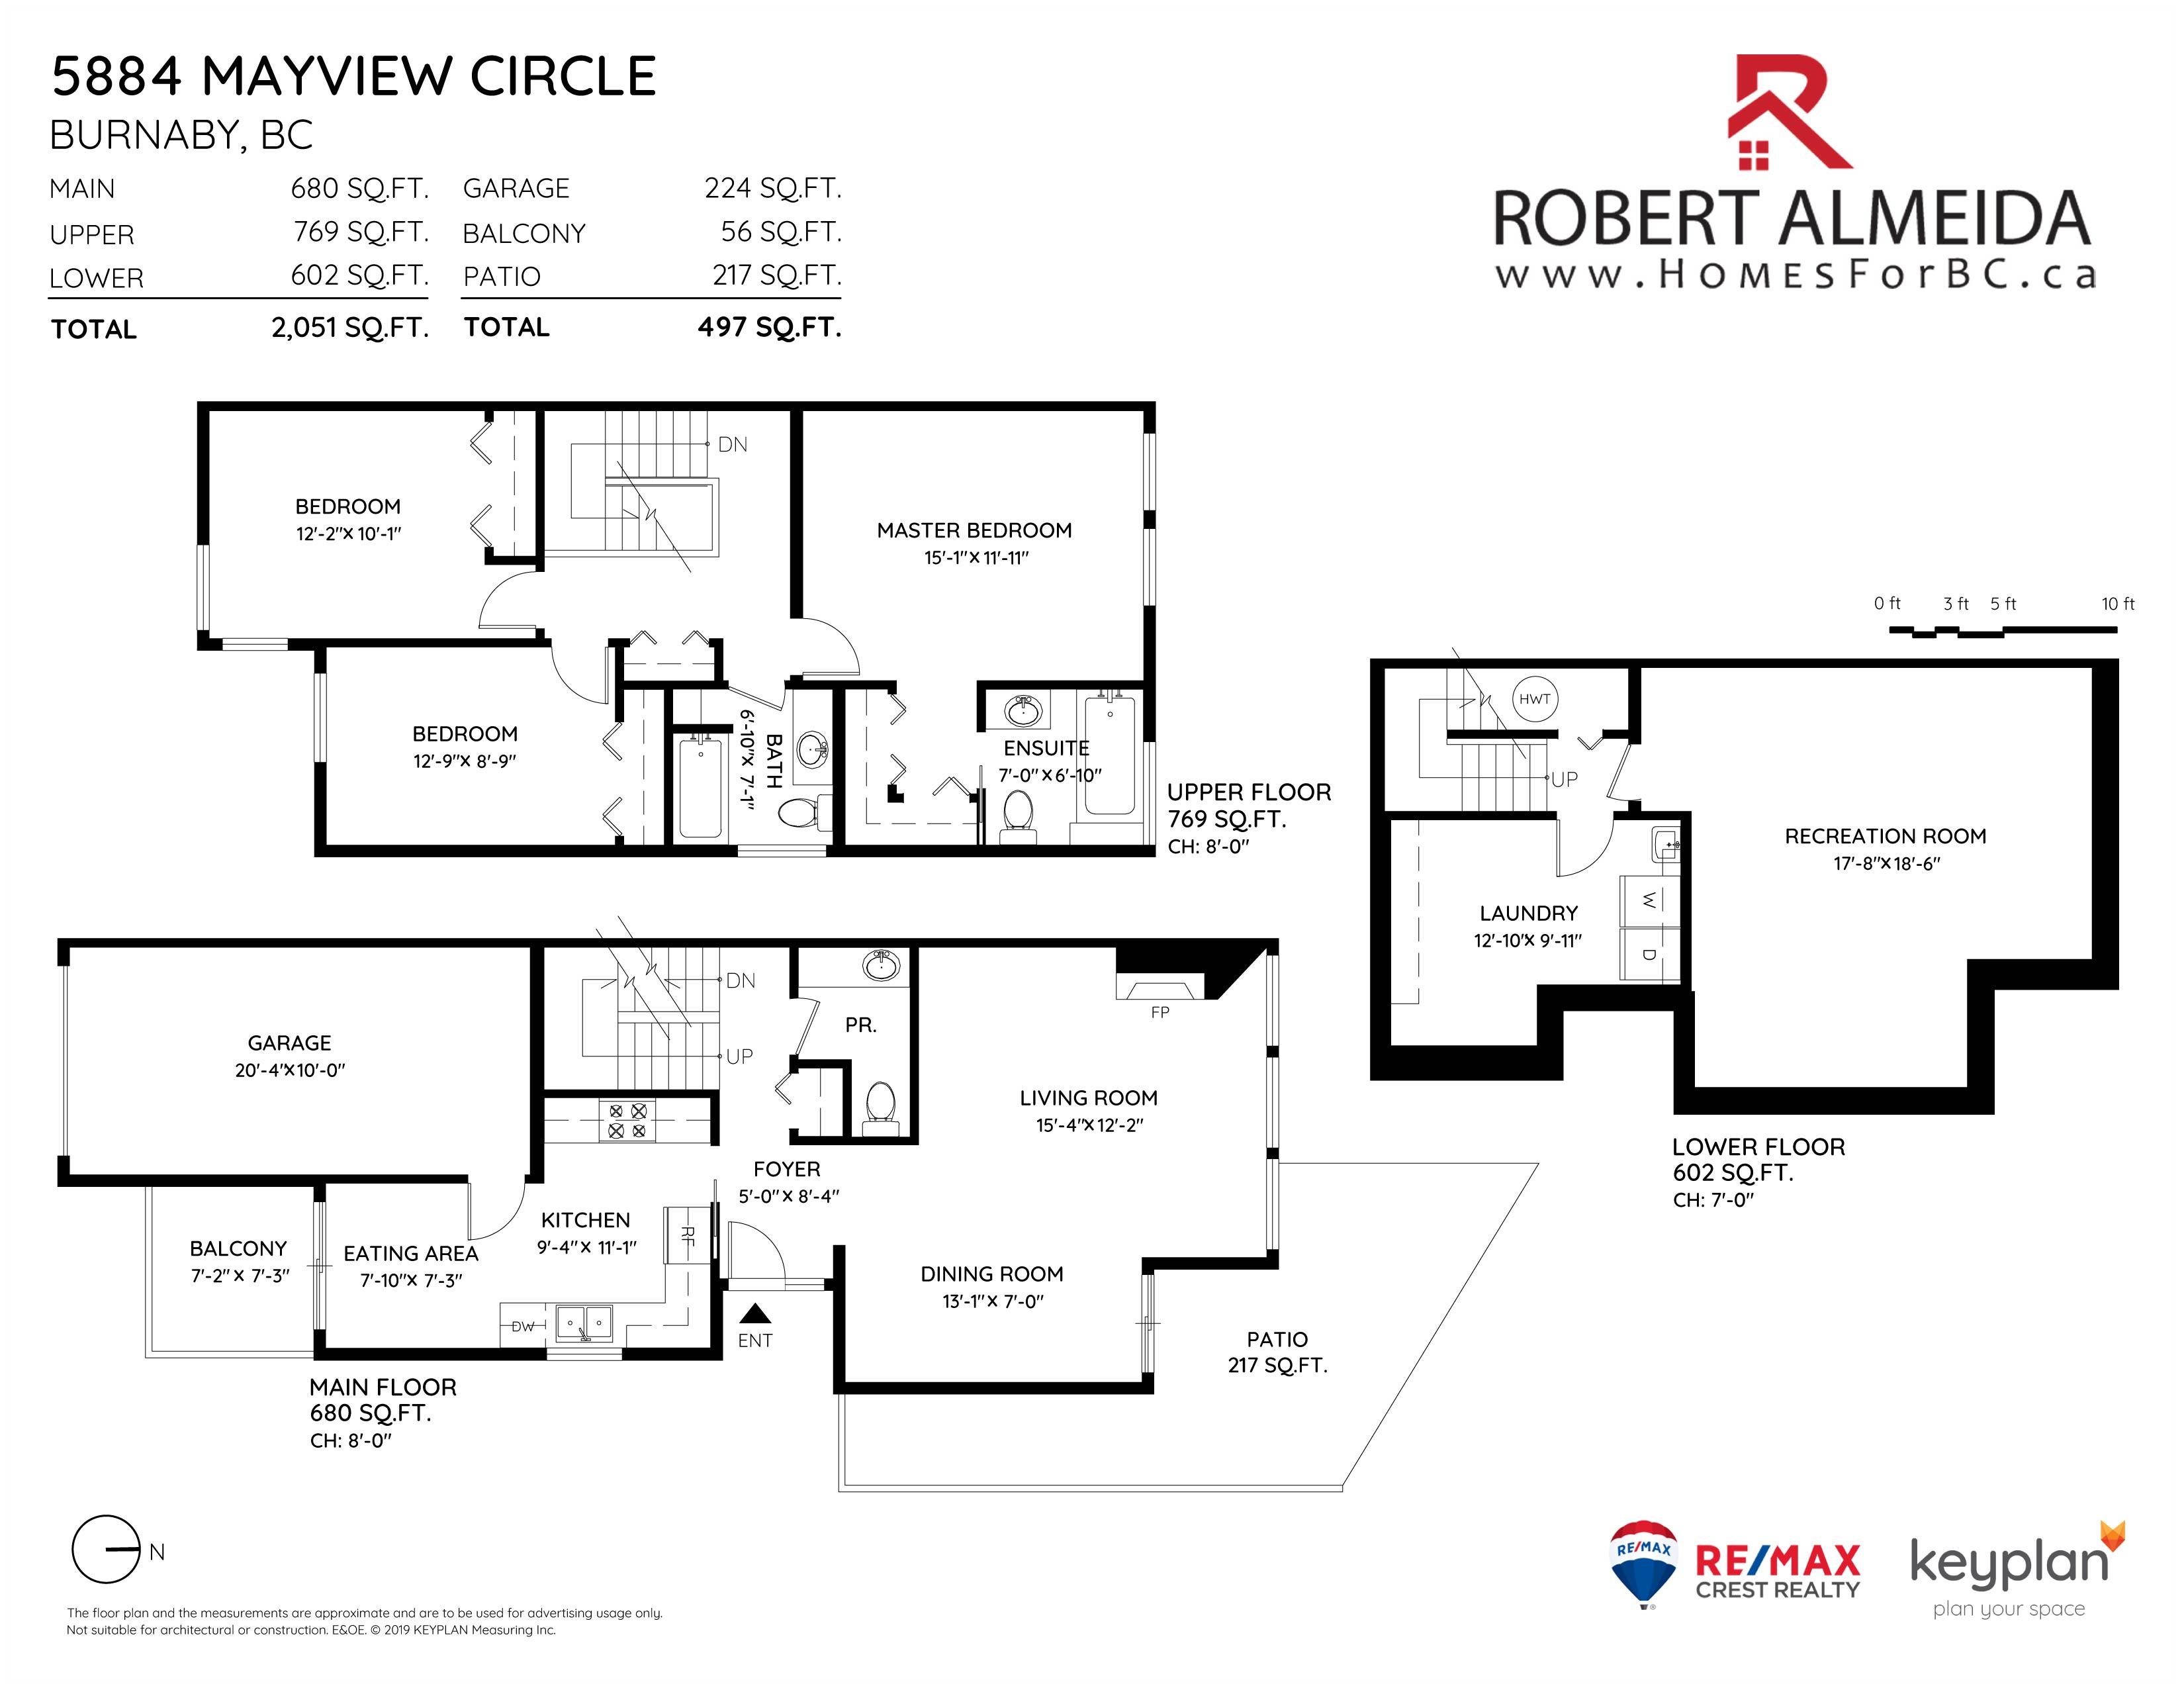 5884 Mayview Circle Burnaby By Robert Almeida Onikon Creative Inc Floorplan